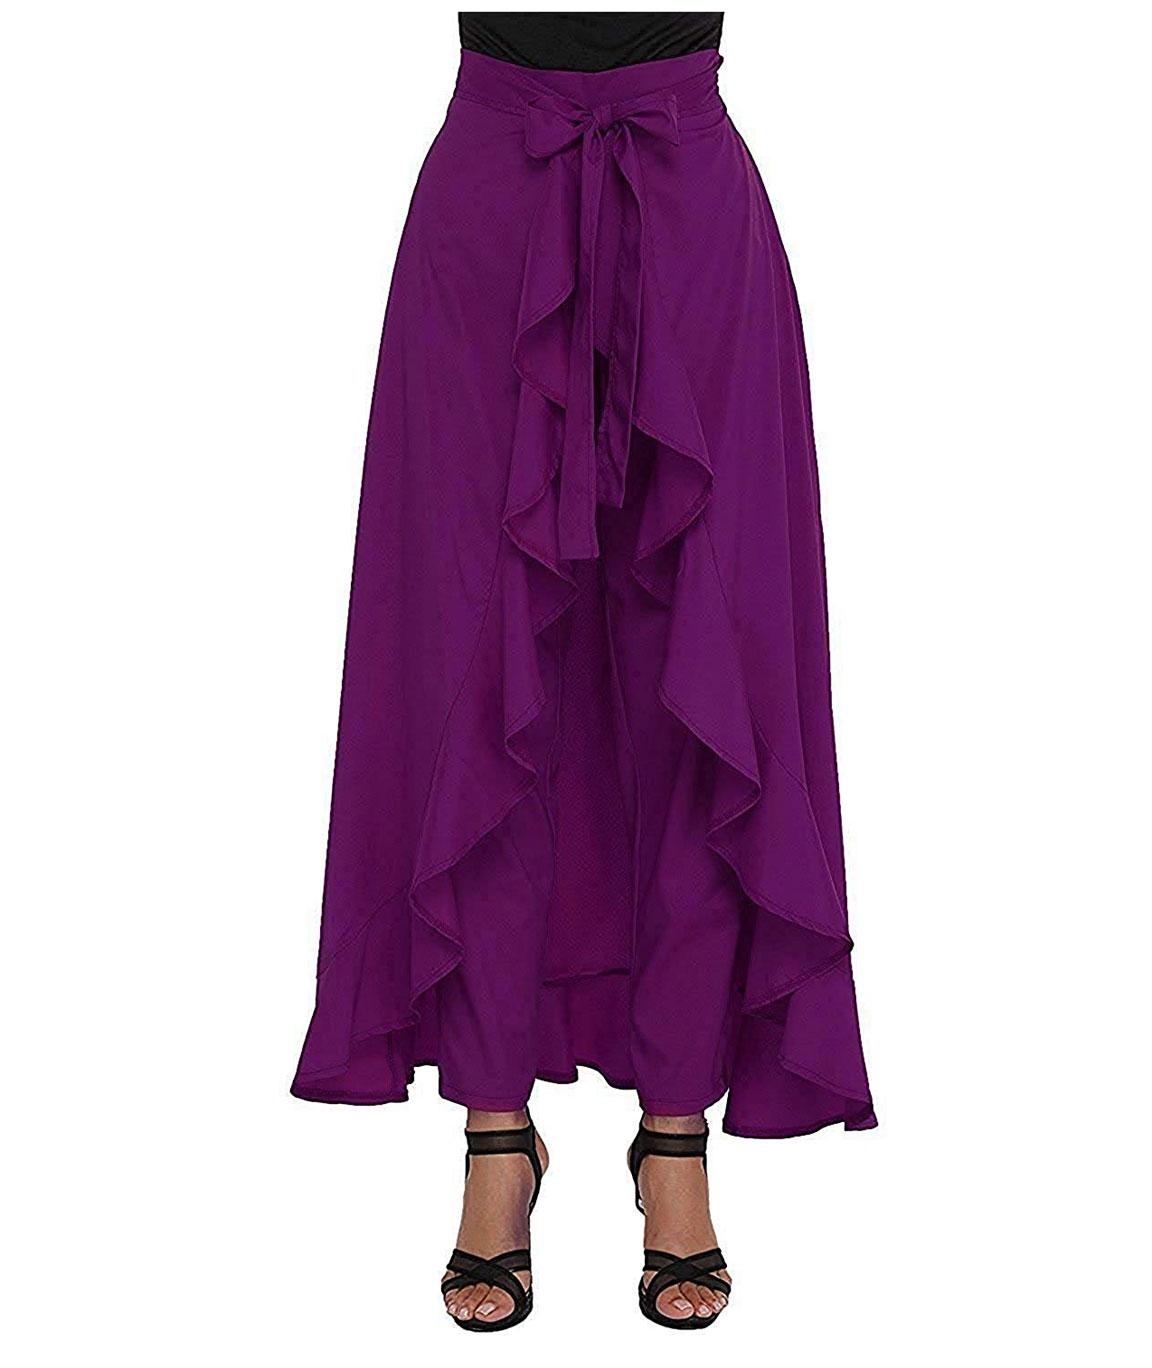 Women` Ruffle Pants Split High Waist Maxi Long Crepe Palazzo Overlay Pant Skirt(purple)